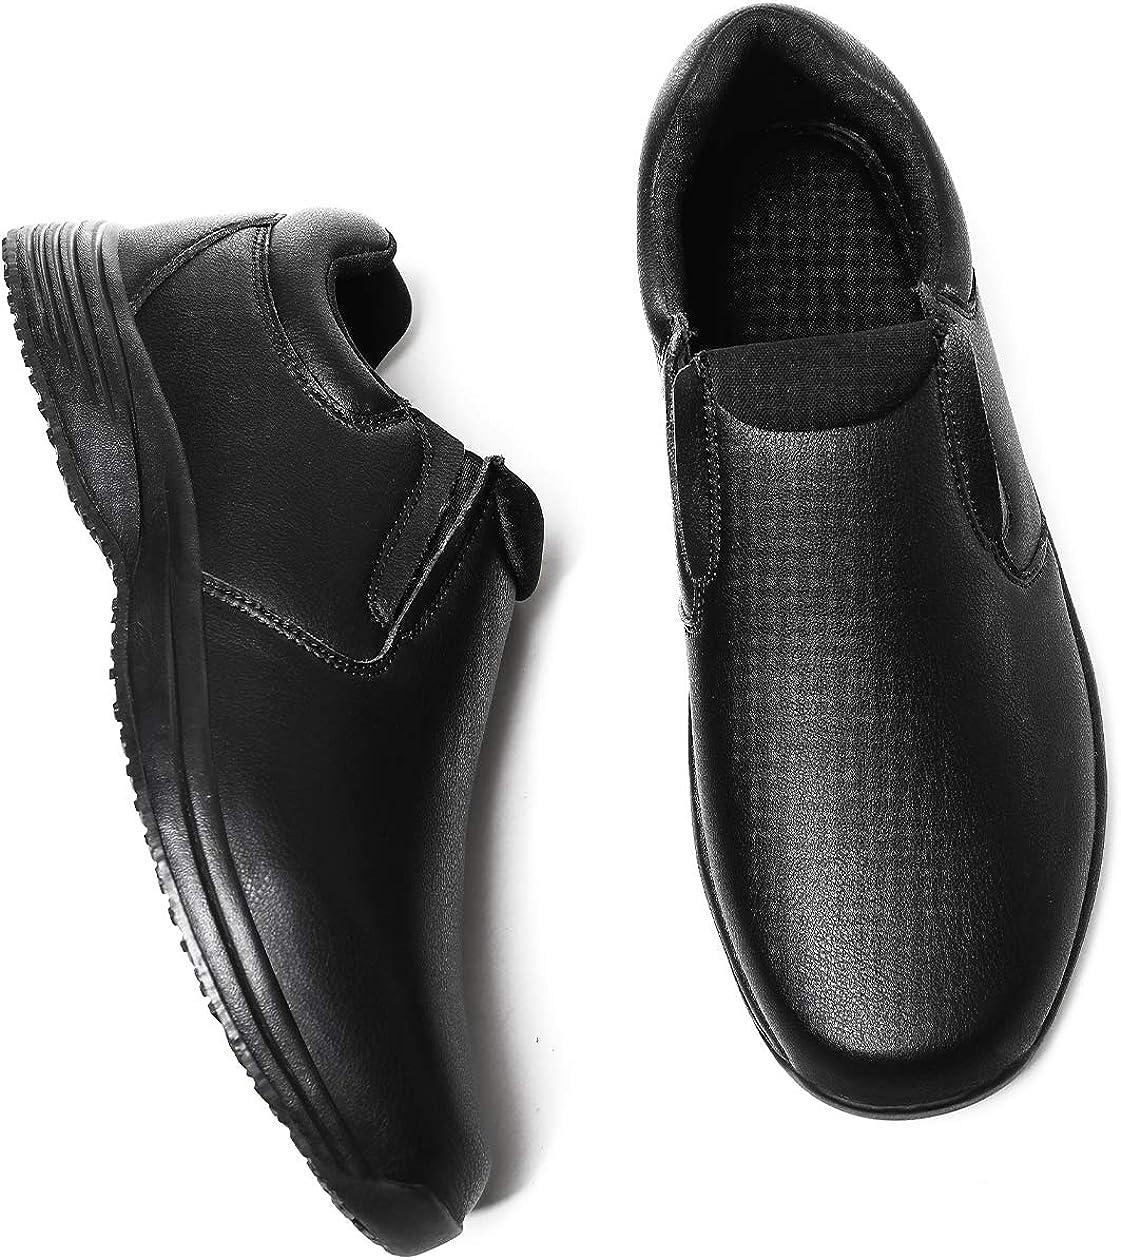 EXEBLUE Kitchen Work Shoes for online shopping Men Slip Water Women Resistant Re Direct sale of manufacturer